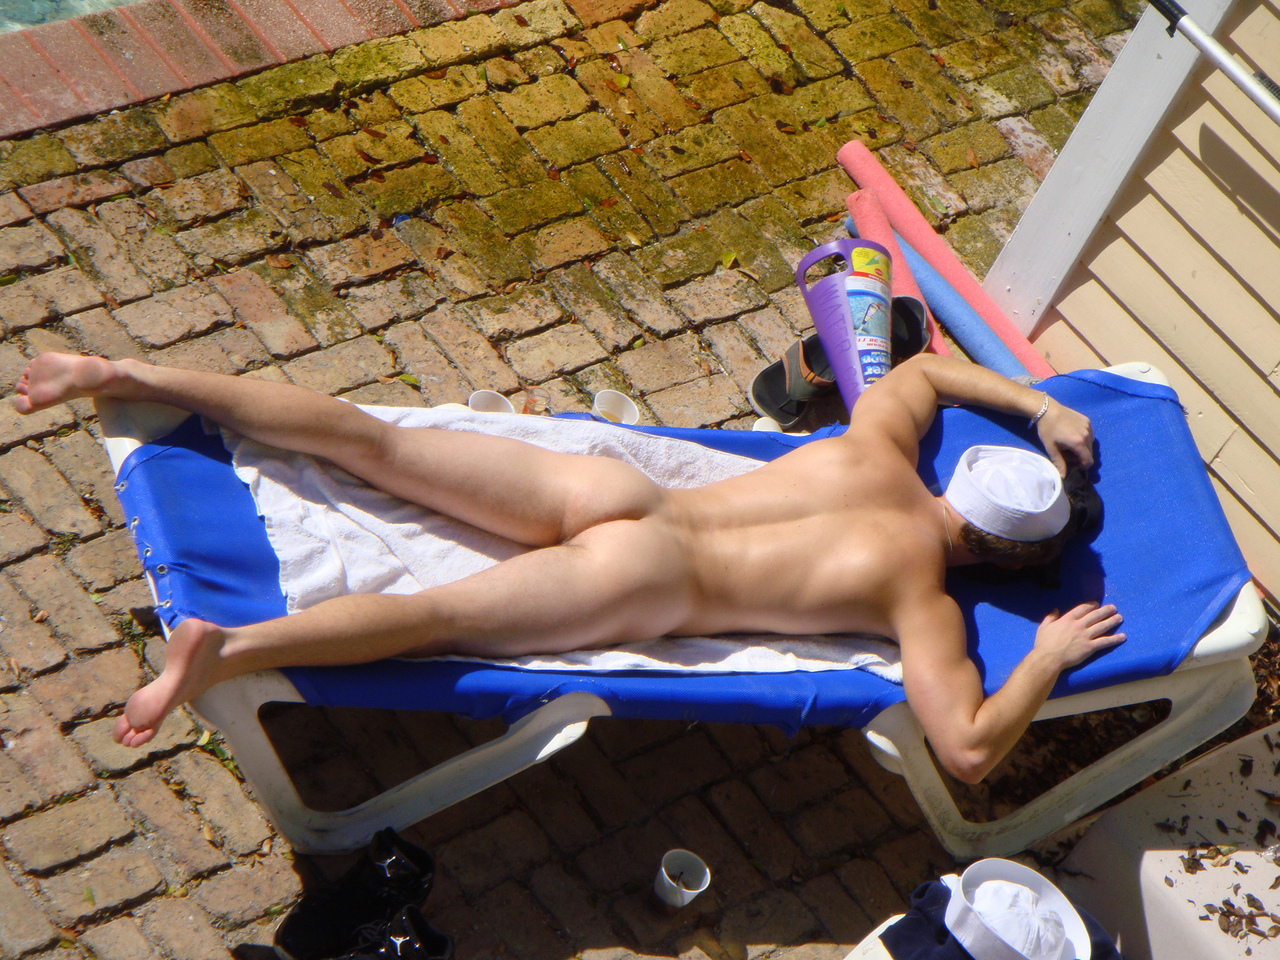 Watch Mature Neighbour Sunbathing Free